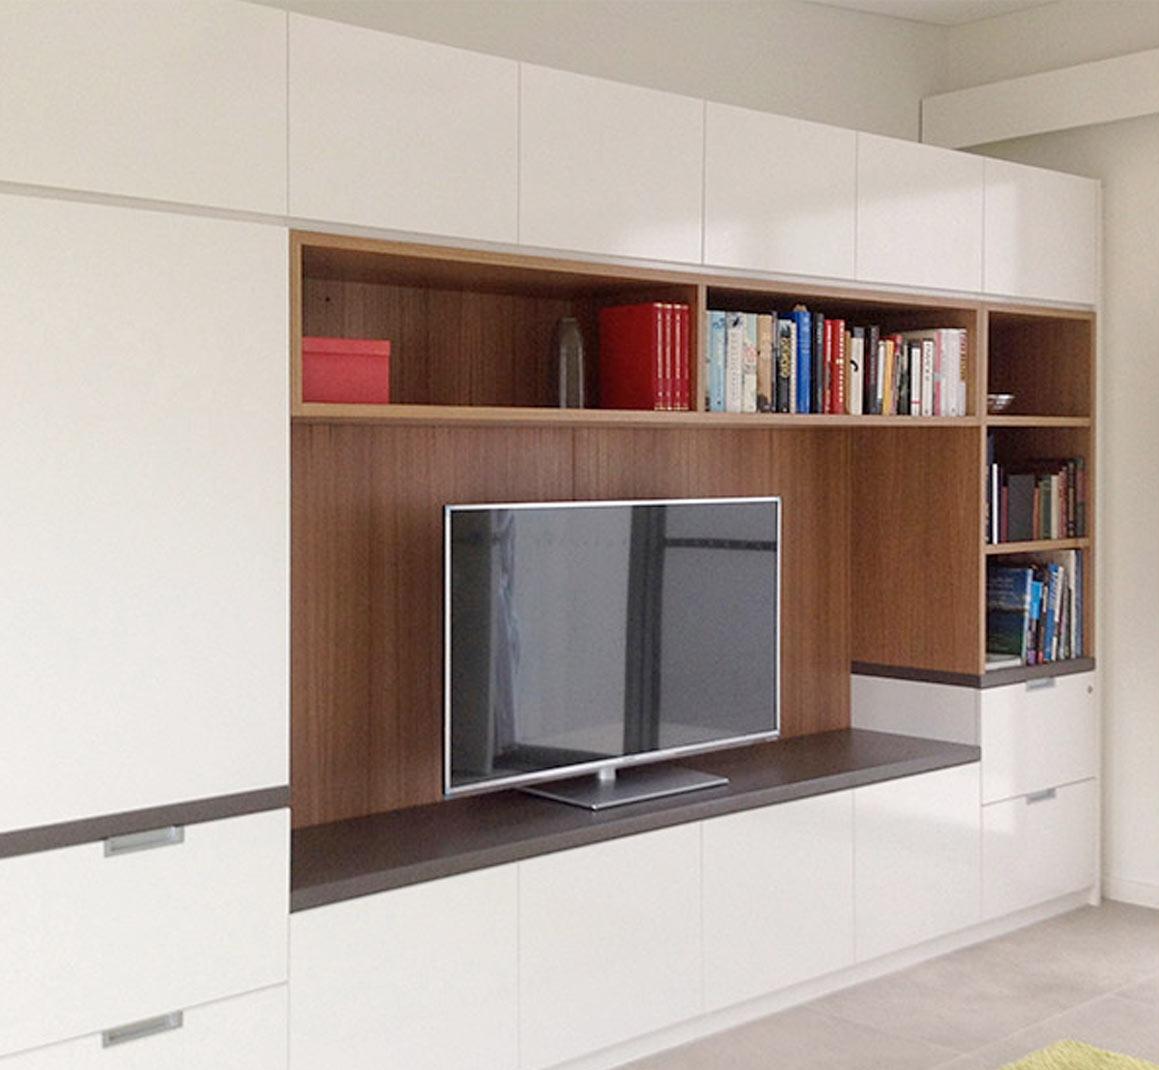 Modular storage system - fully customised